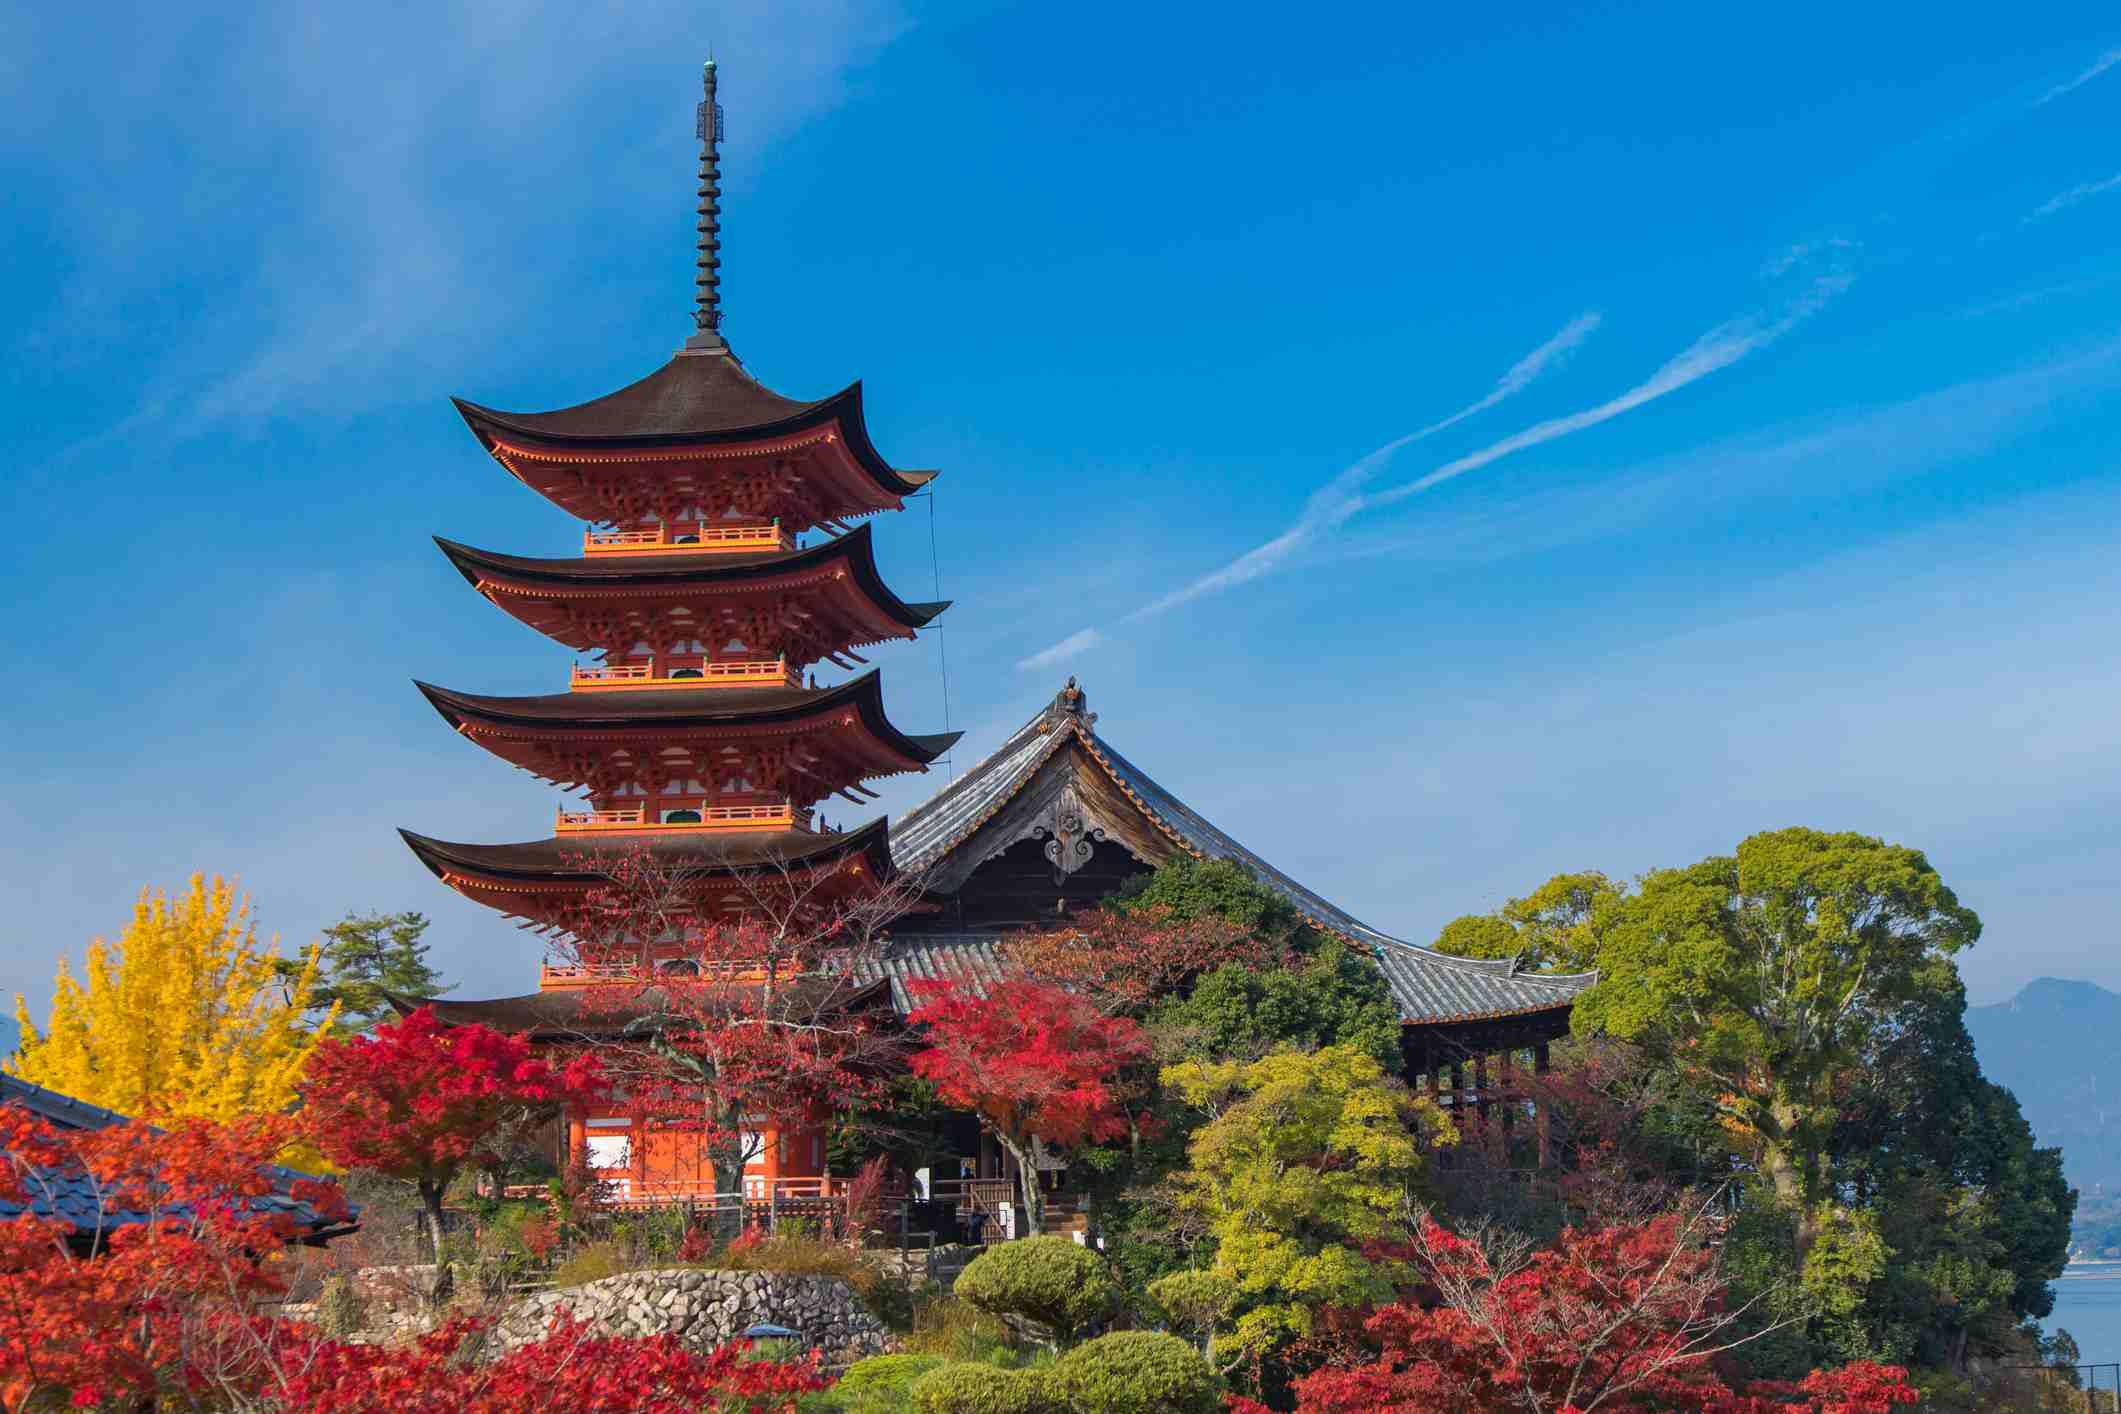 Five-story pagoda in the autumn, a UNESCO World Heritage Site Itsukushima Shrine, Miyajima, Japan